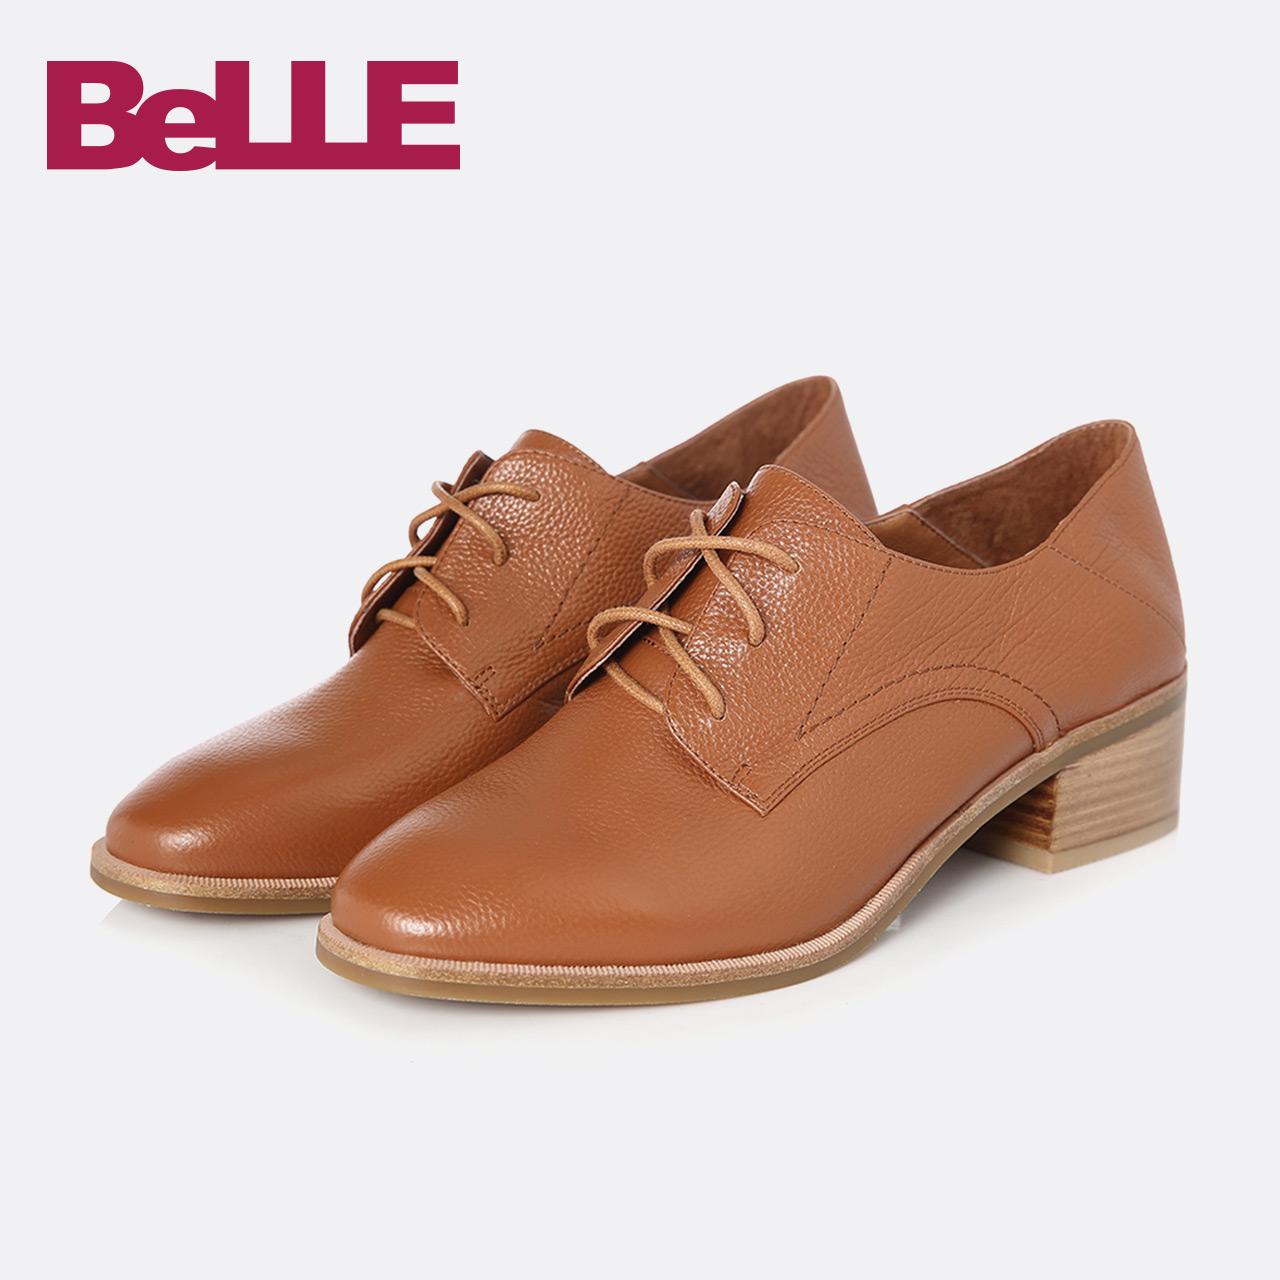 Belle-百丽单鞋2018春新款商场牛皮低帮平底休闲女鞋S1W1DAM8